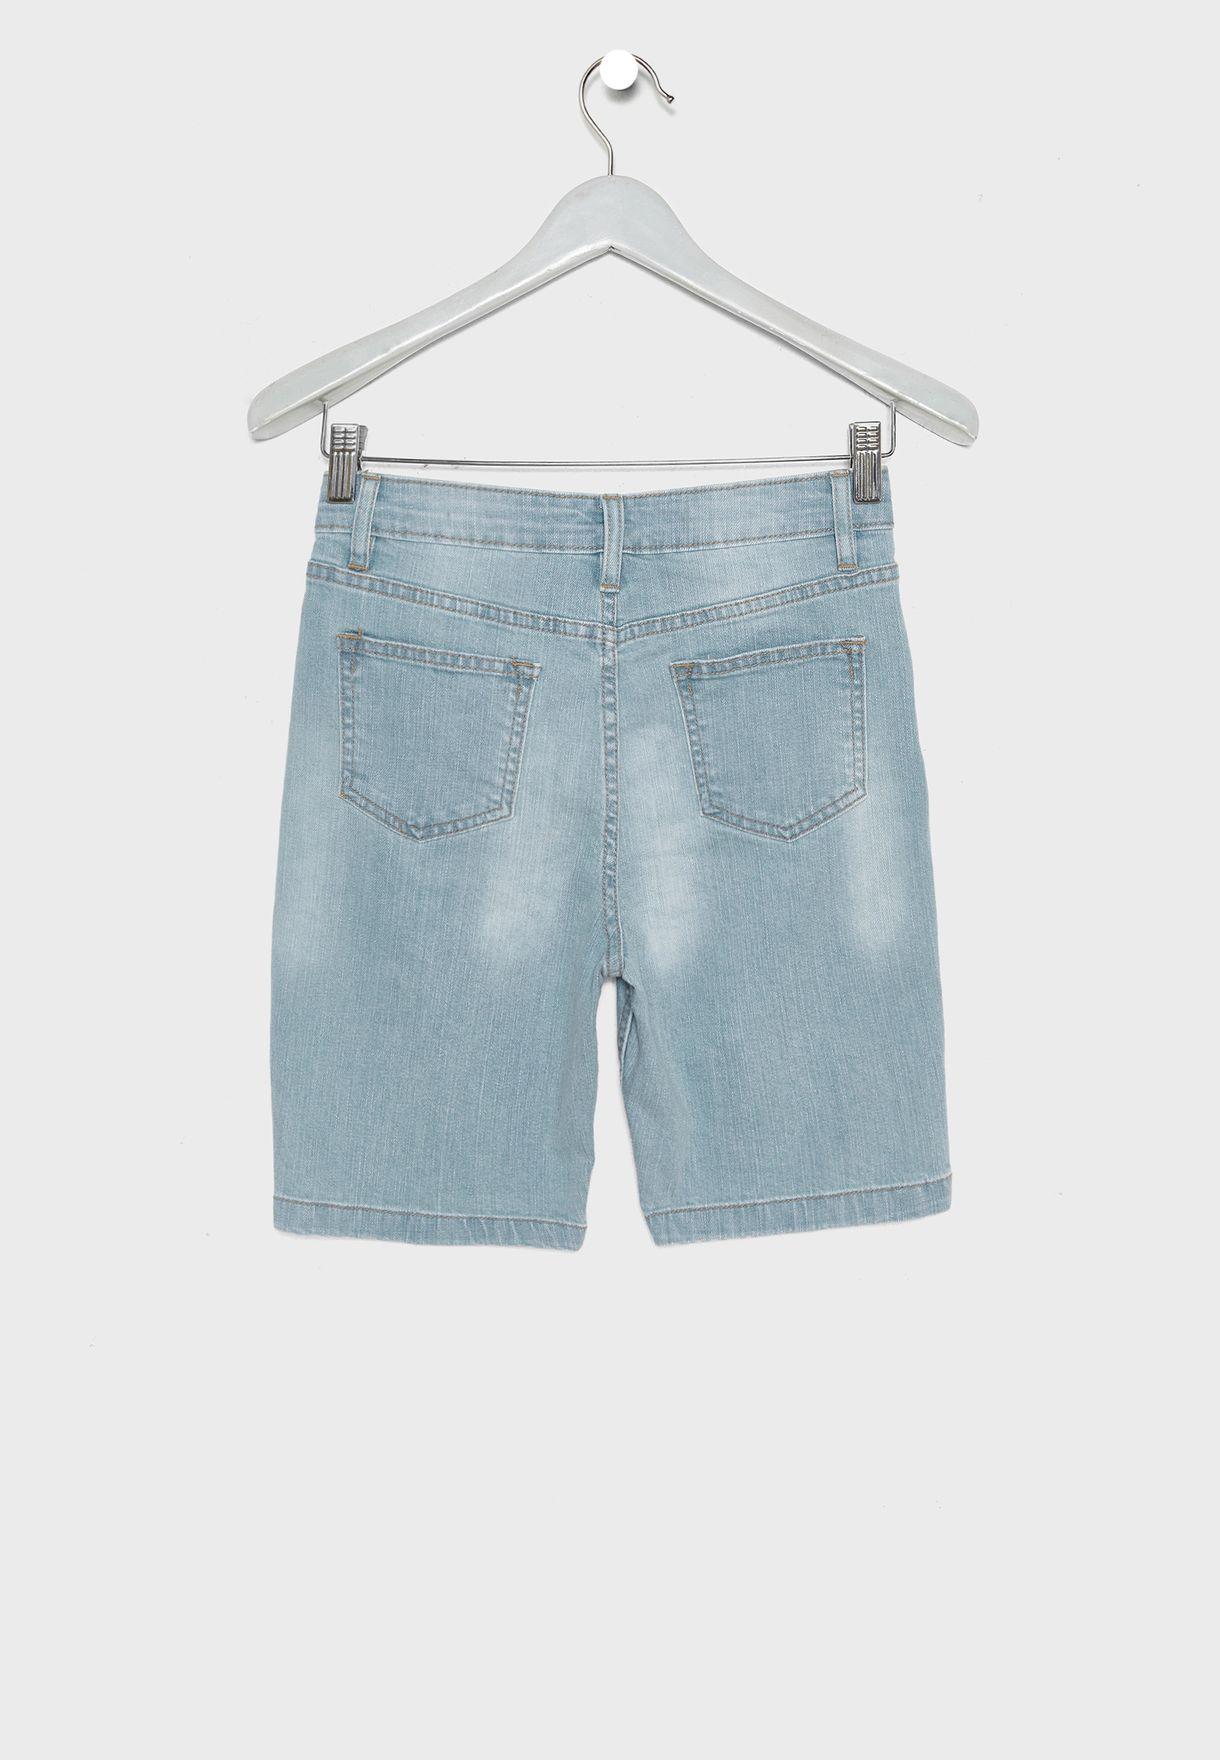 Kids Ripped Shorts